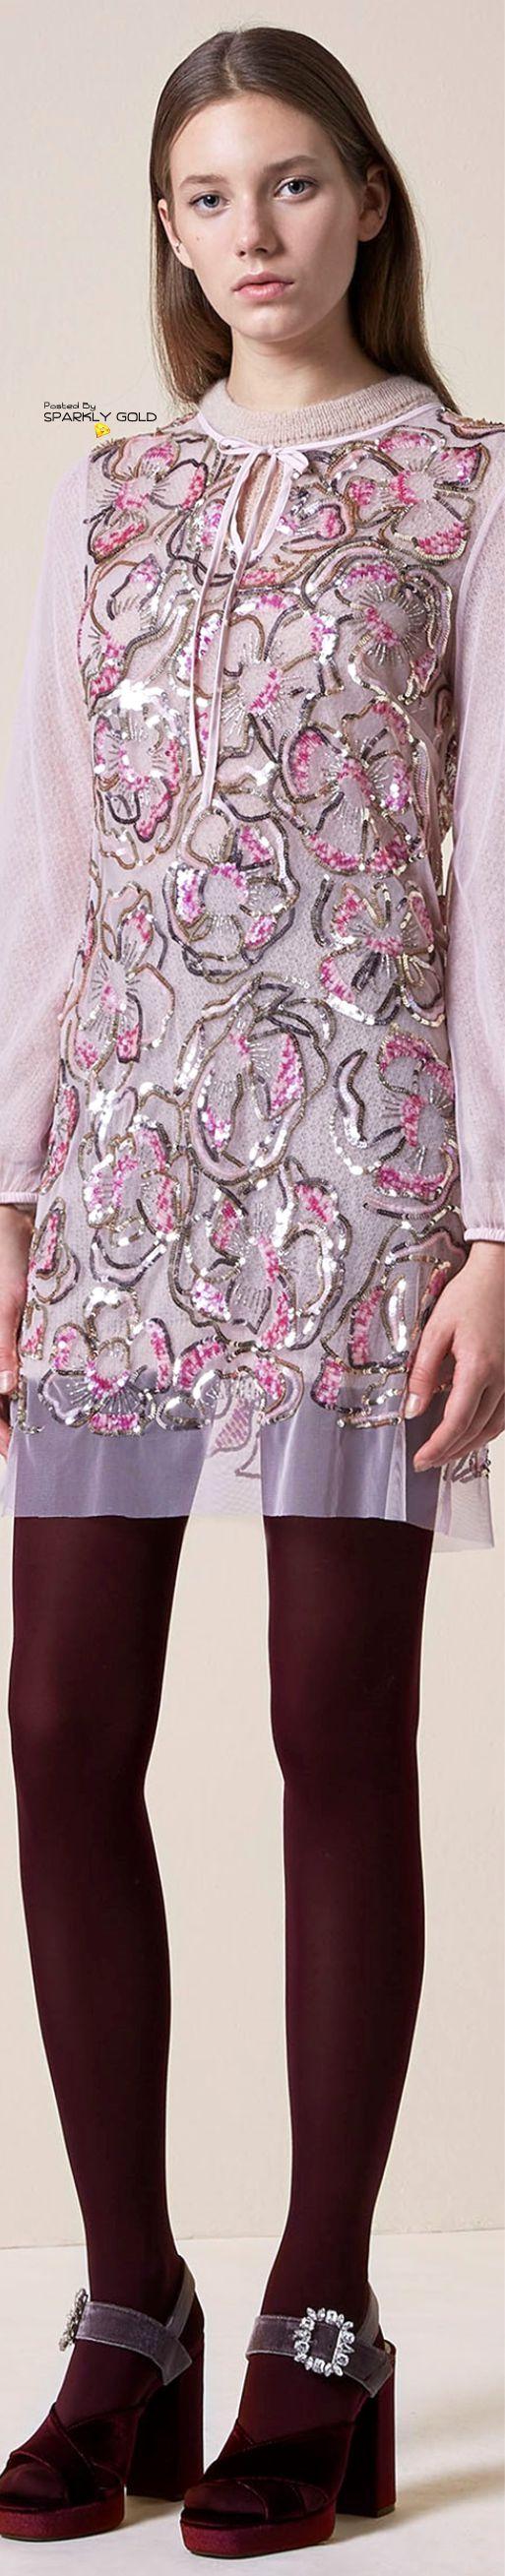 Blugirl PreFall   Fashion Dresses  Pinterest  Street styles